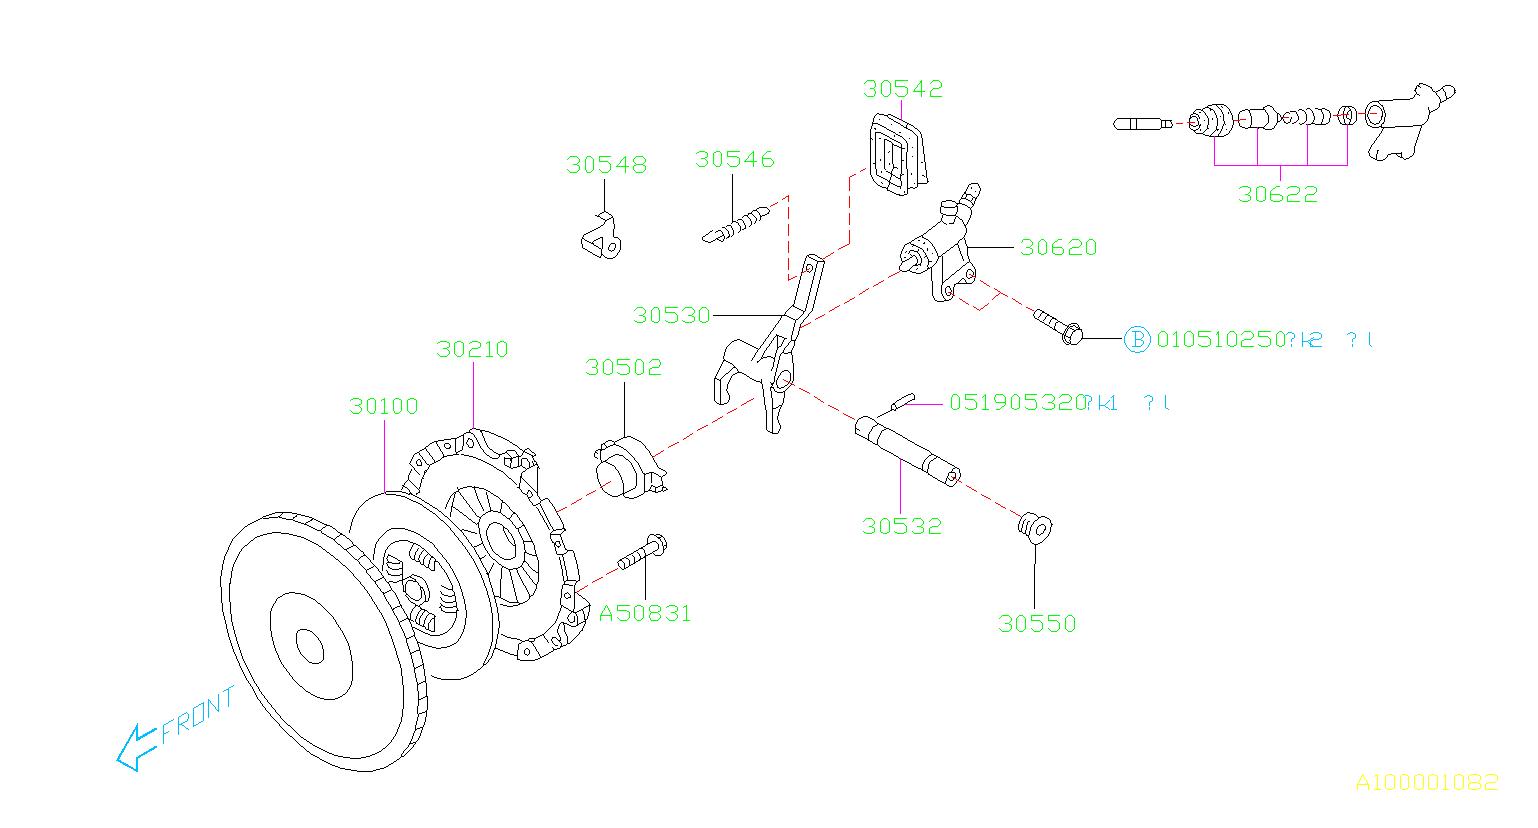 [DIAGRAM] Subaru Forester Wiring Diagram Transmission For